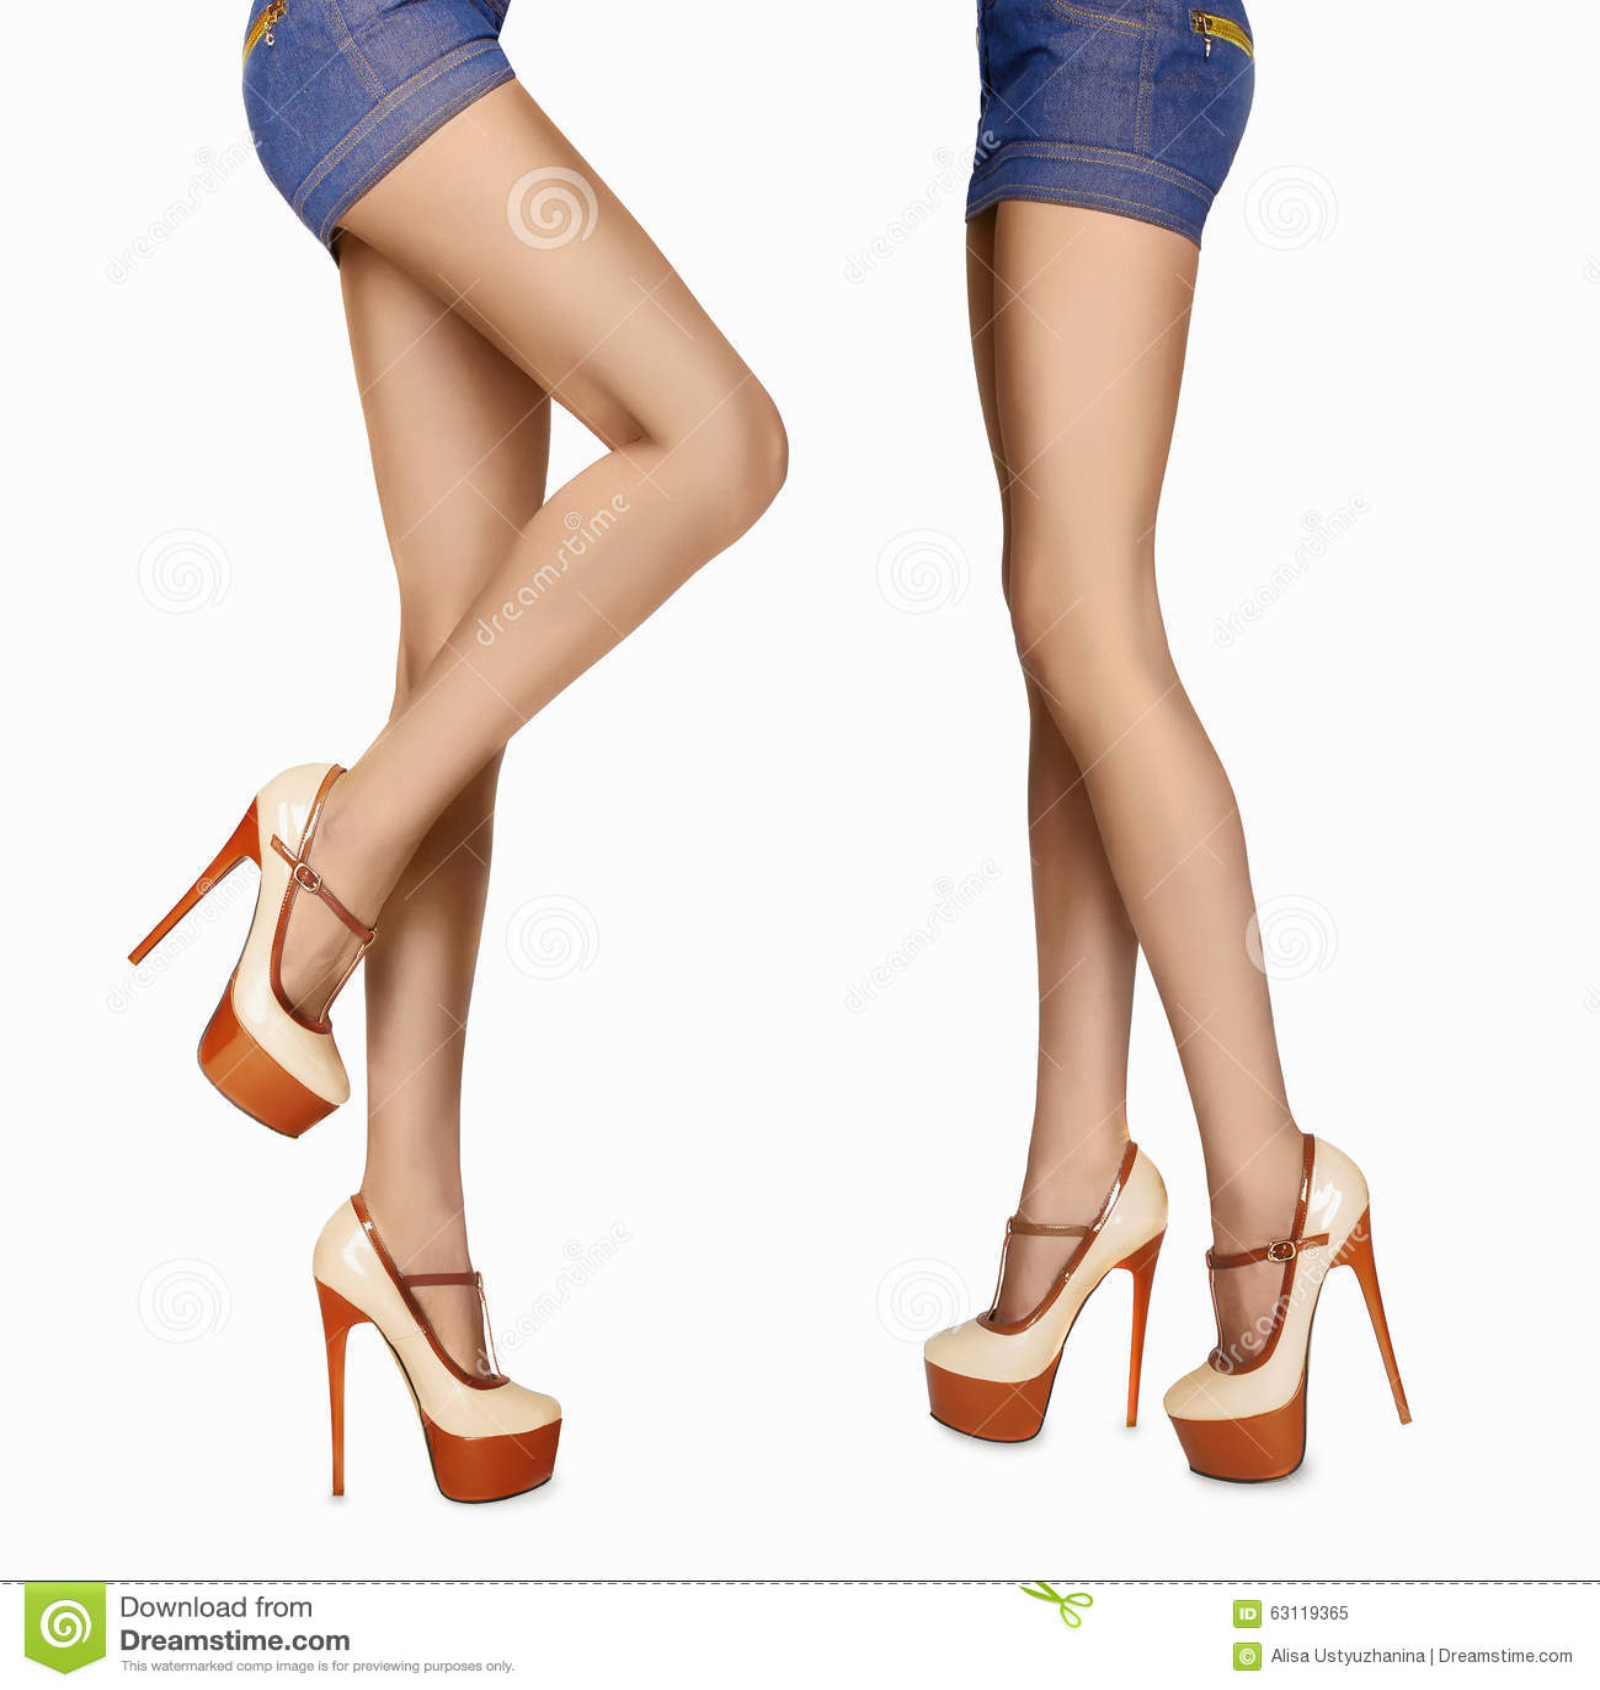 foto-kogda-foto-dlinnih-seksi-nogi-porno-roliki